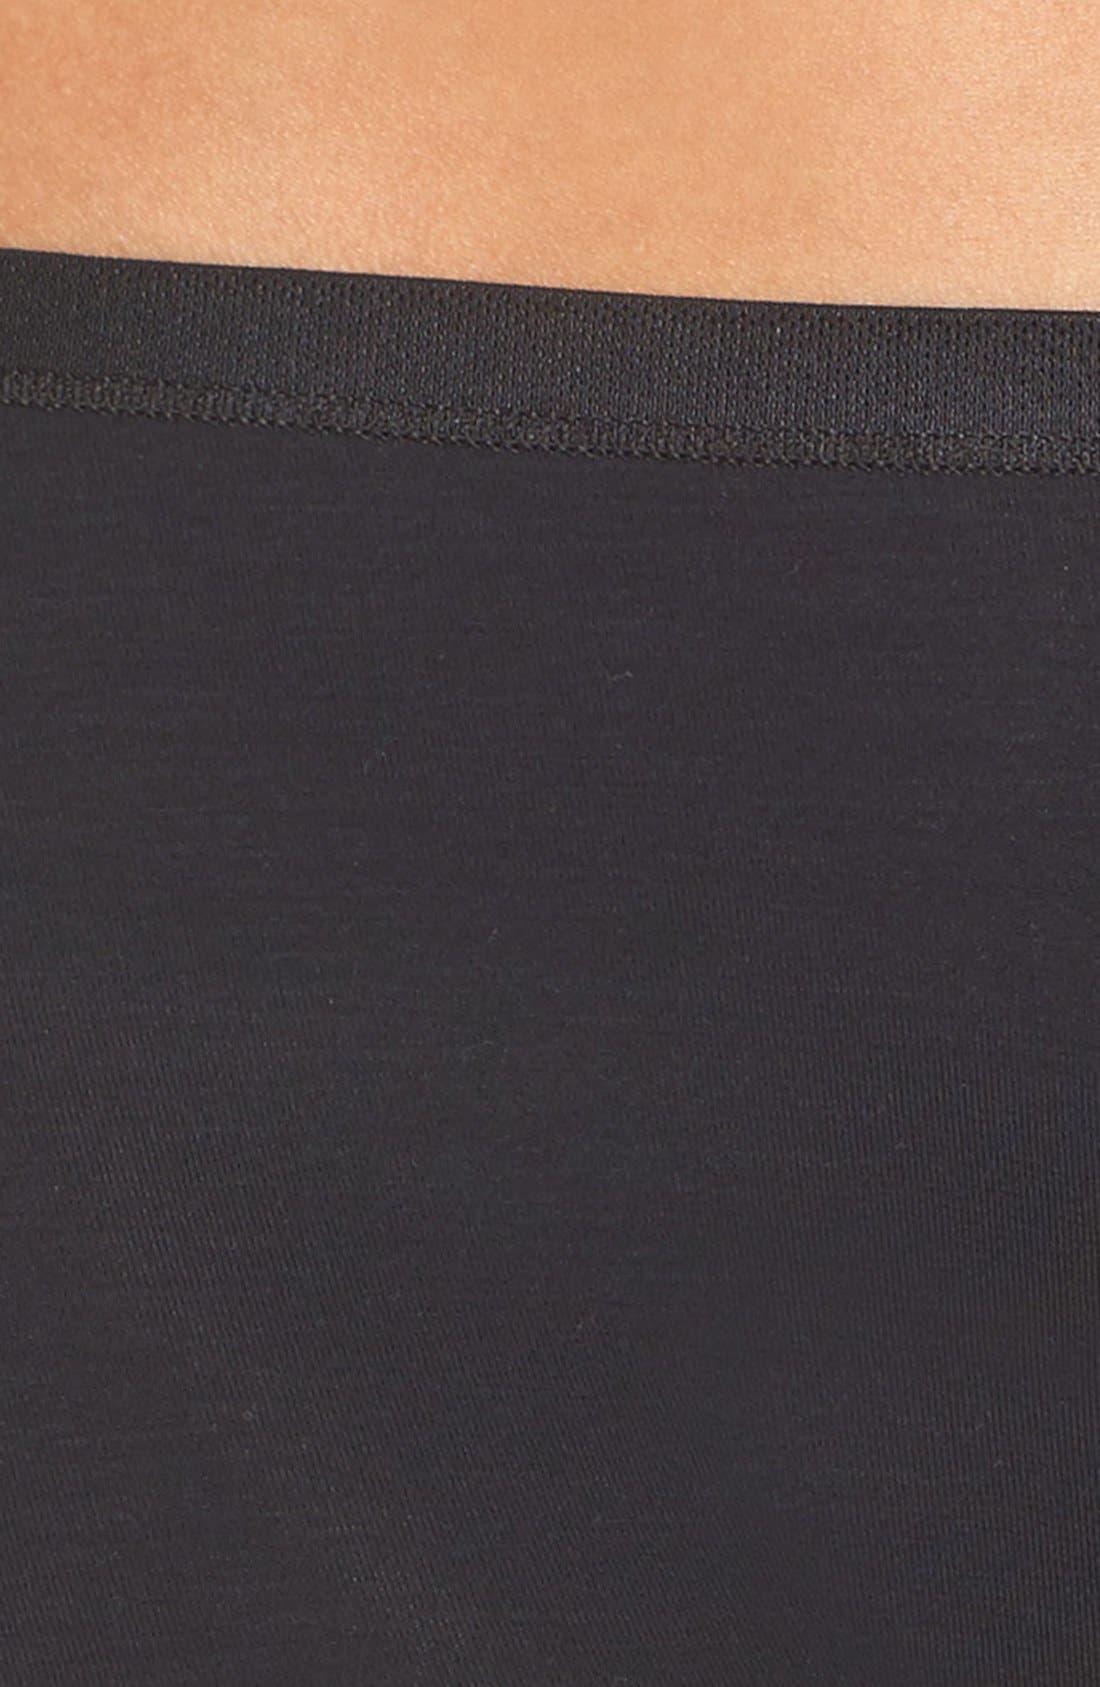 Soft Touch Stretch Modal Boyshorts,                             Alternate thumbnail 4, color,                             BLACK